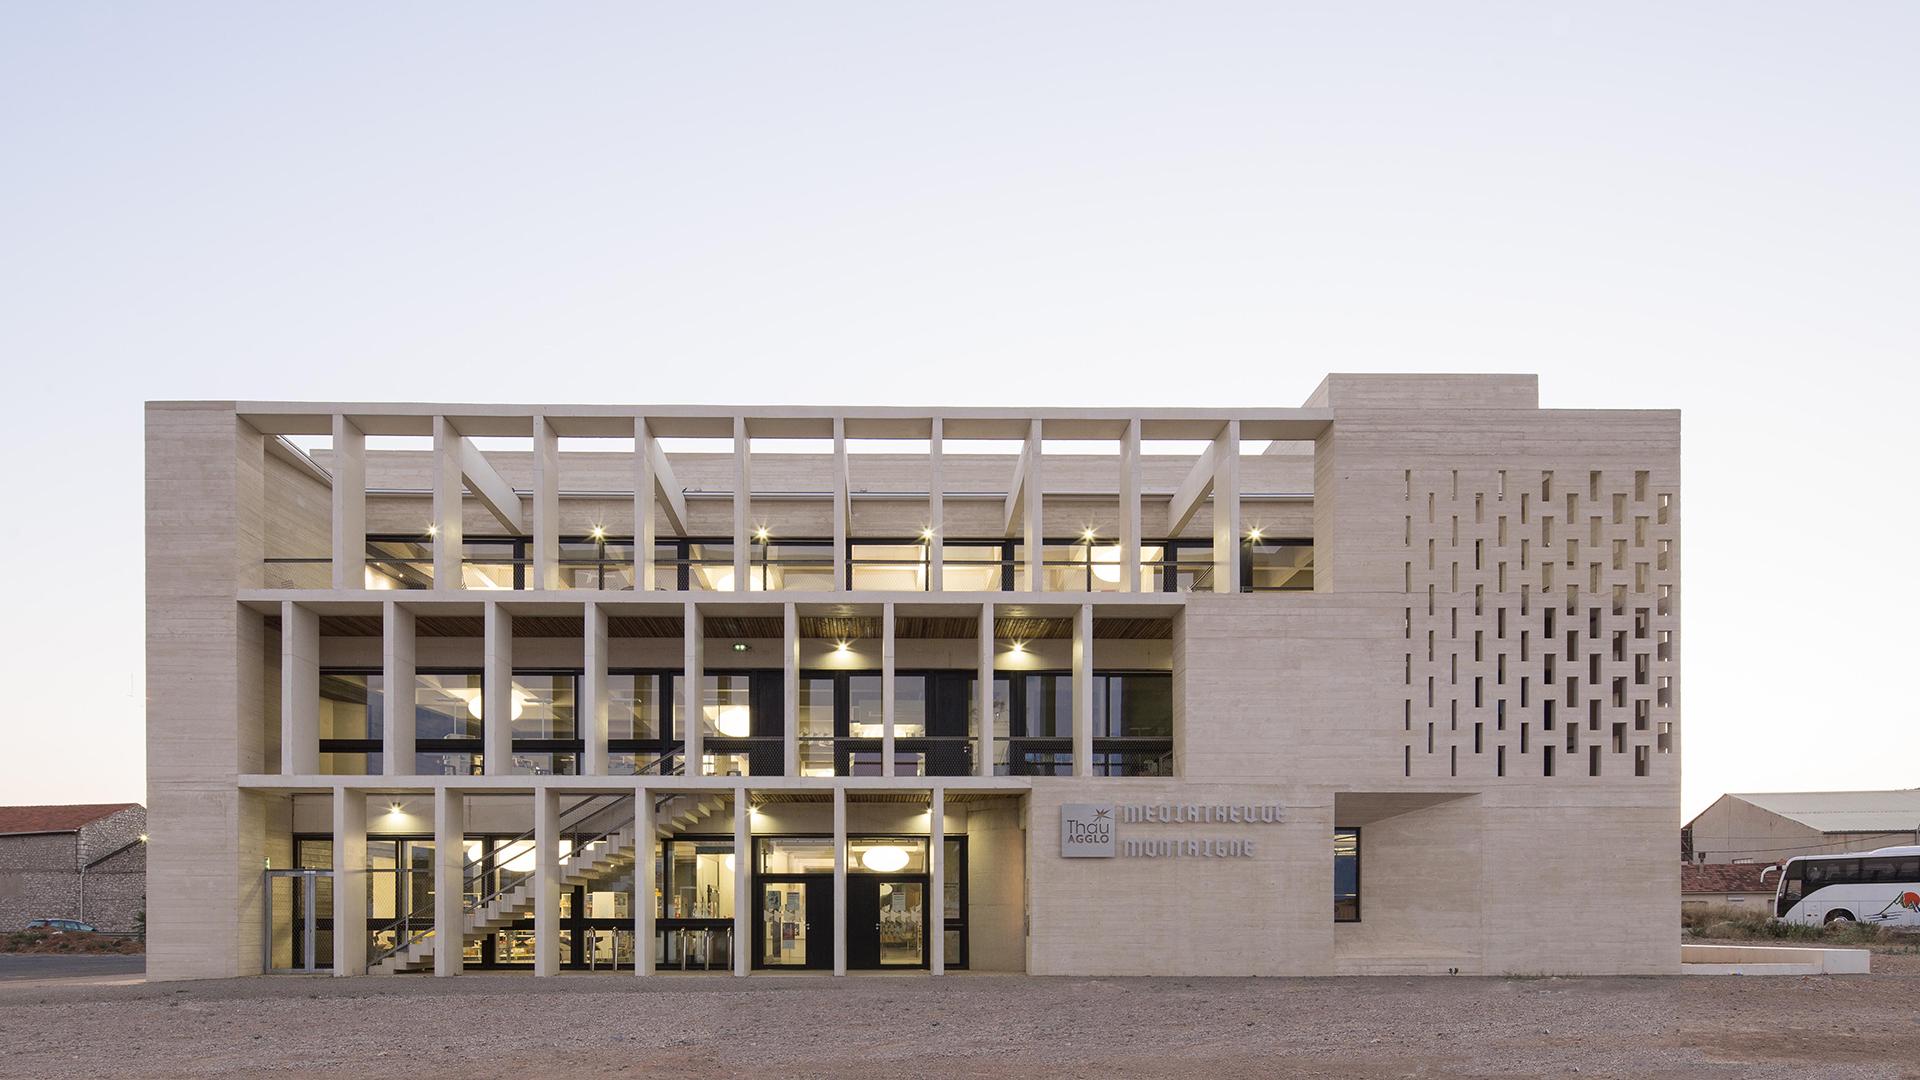 Médiathèque Montaigne – Frontignan